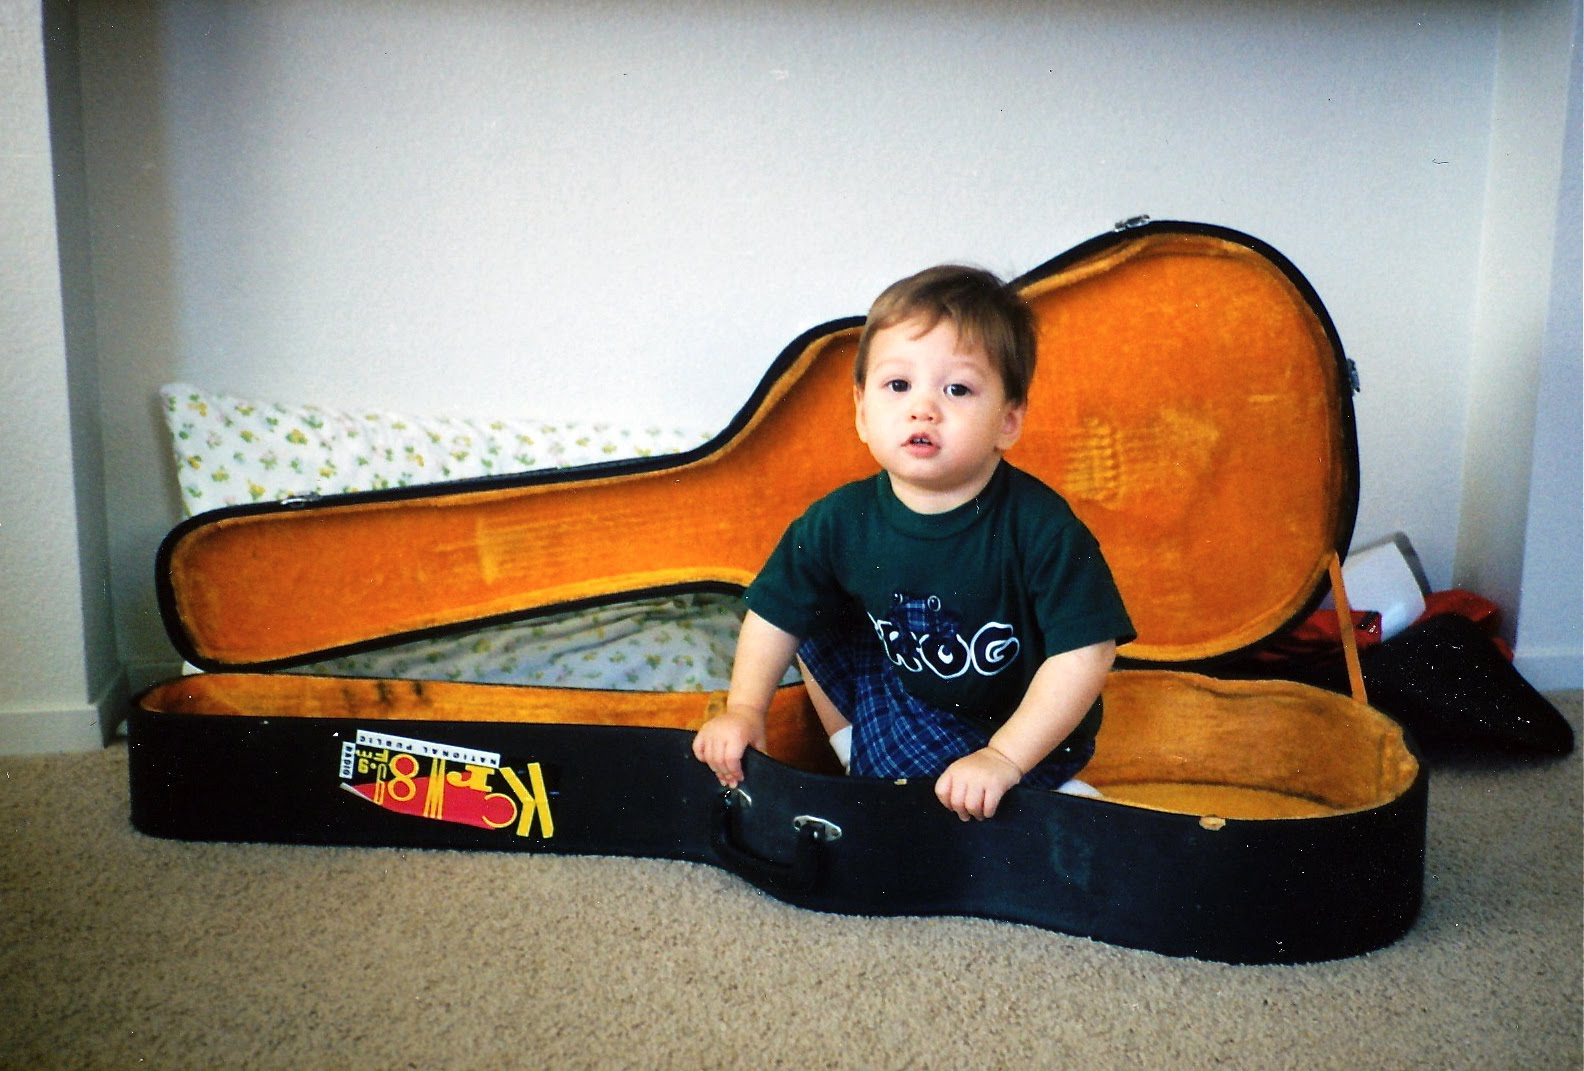 [Noah+in+Guitar+Case]